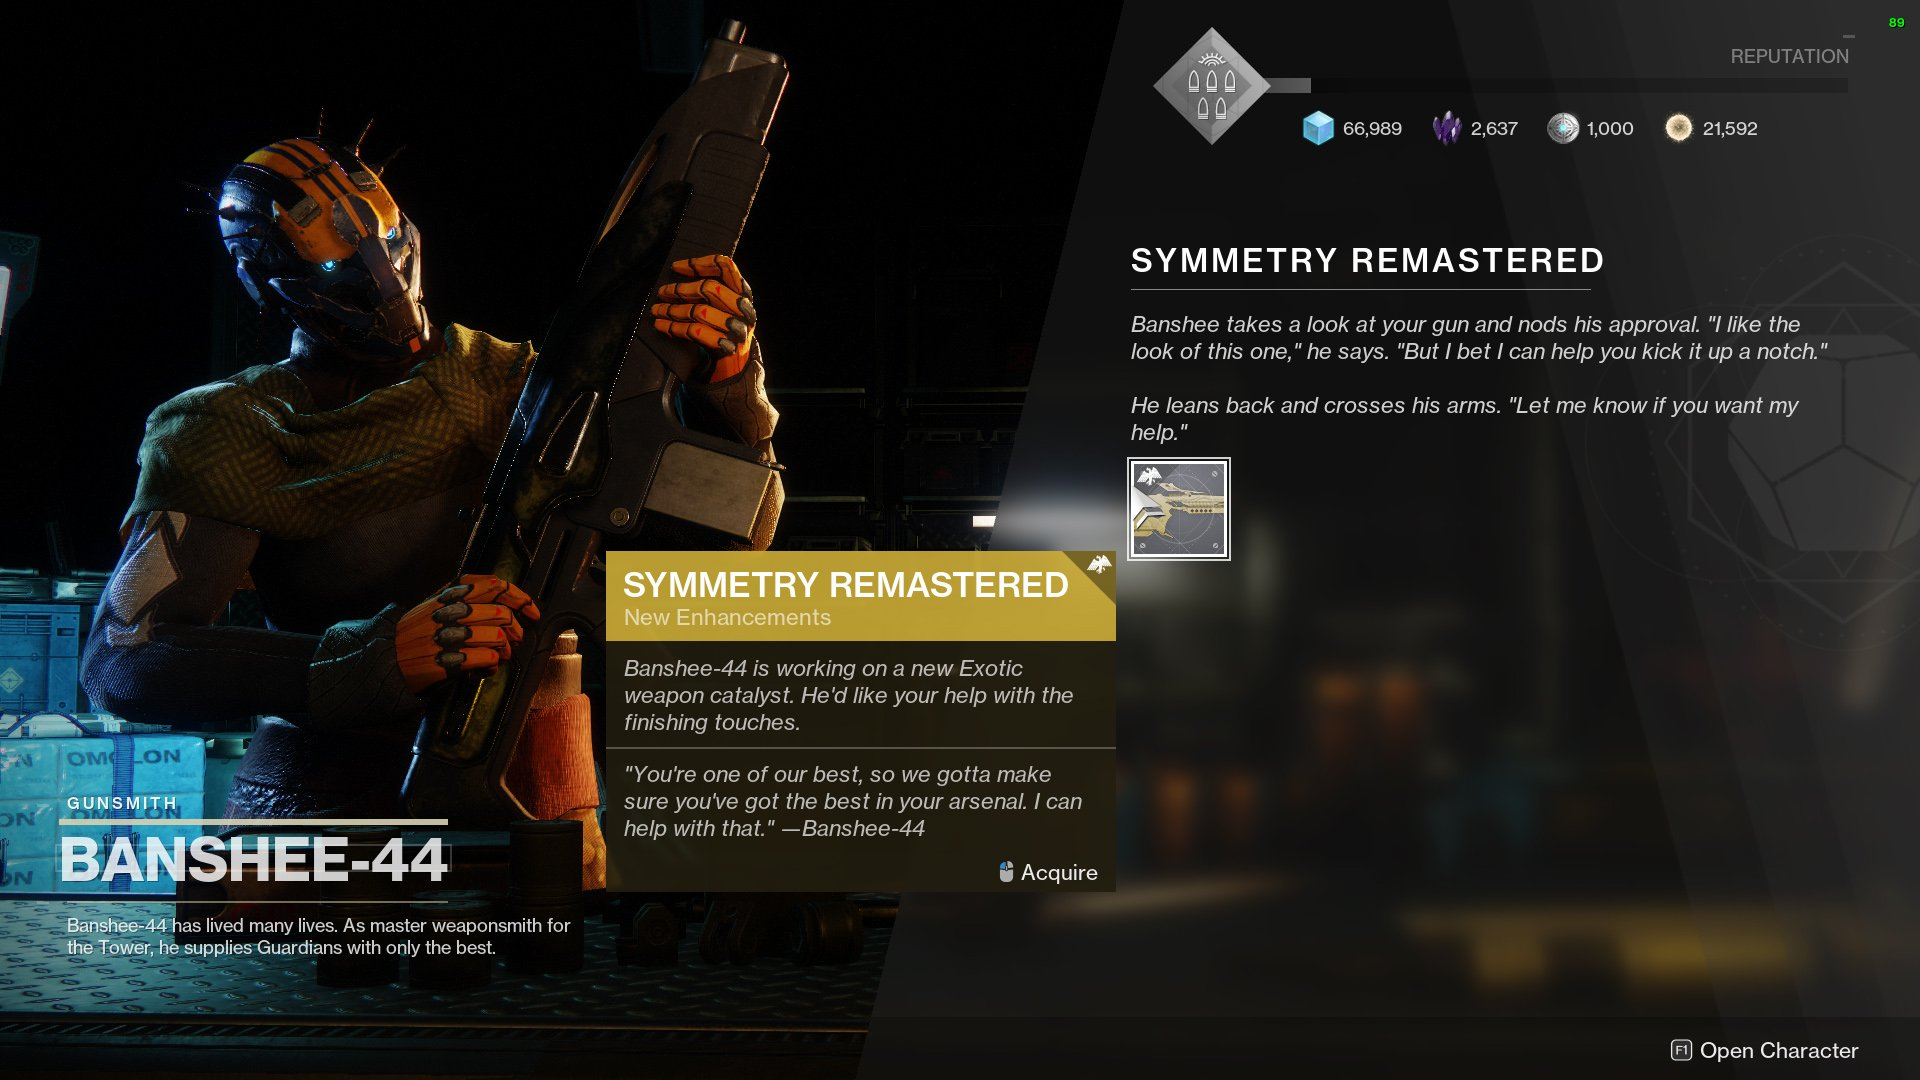 Destiny 2 Symmetry Remastered